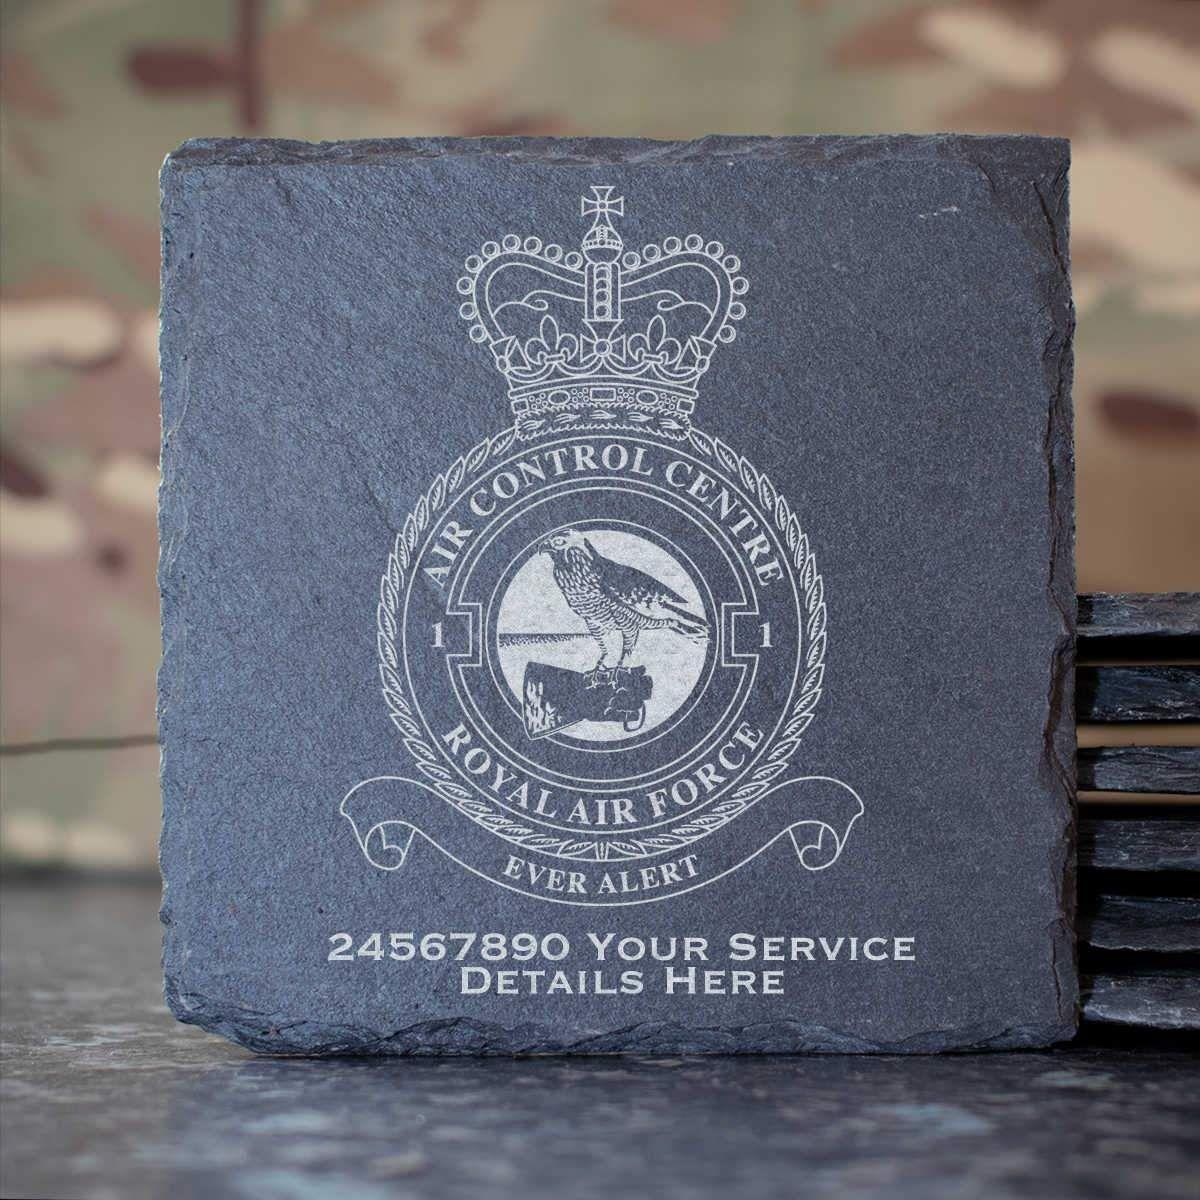 RAF 1 Air Control Centre Slate Coaster (261) -